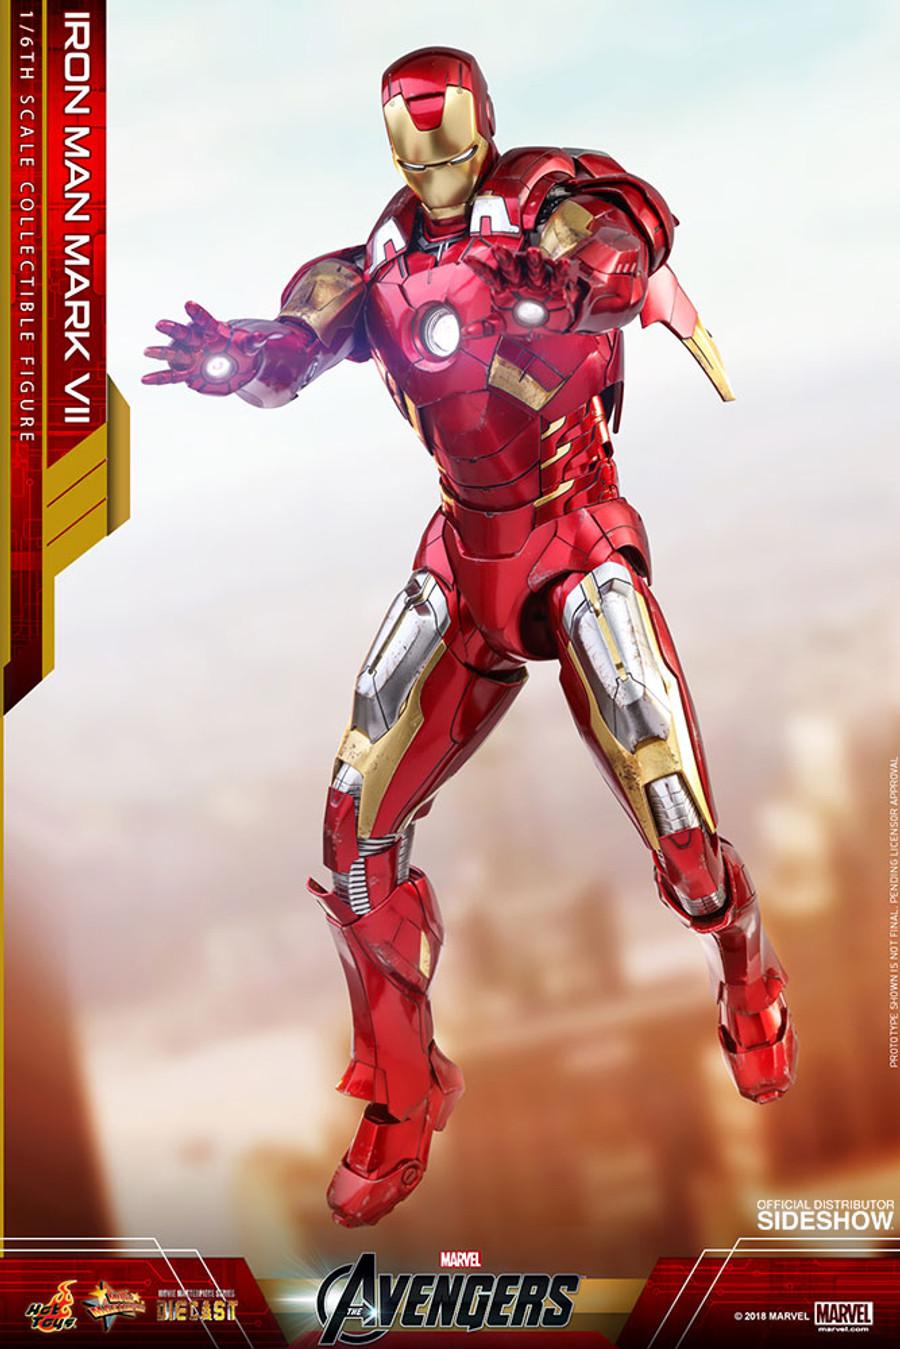 Hot Toys - Avengers: Iron Man Mark VII Diecast